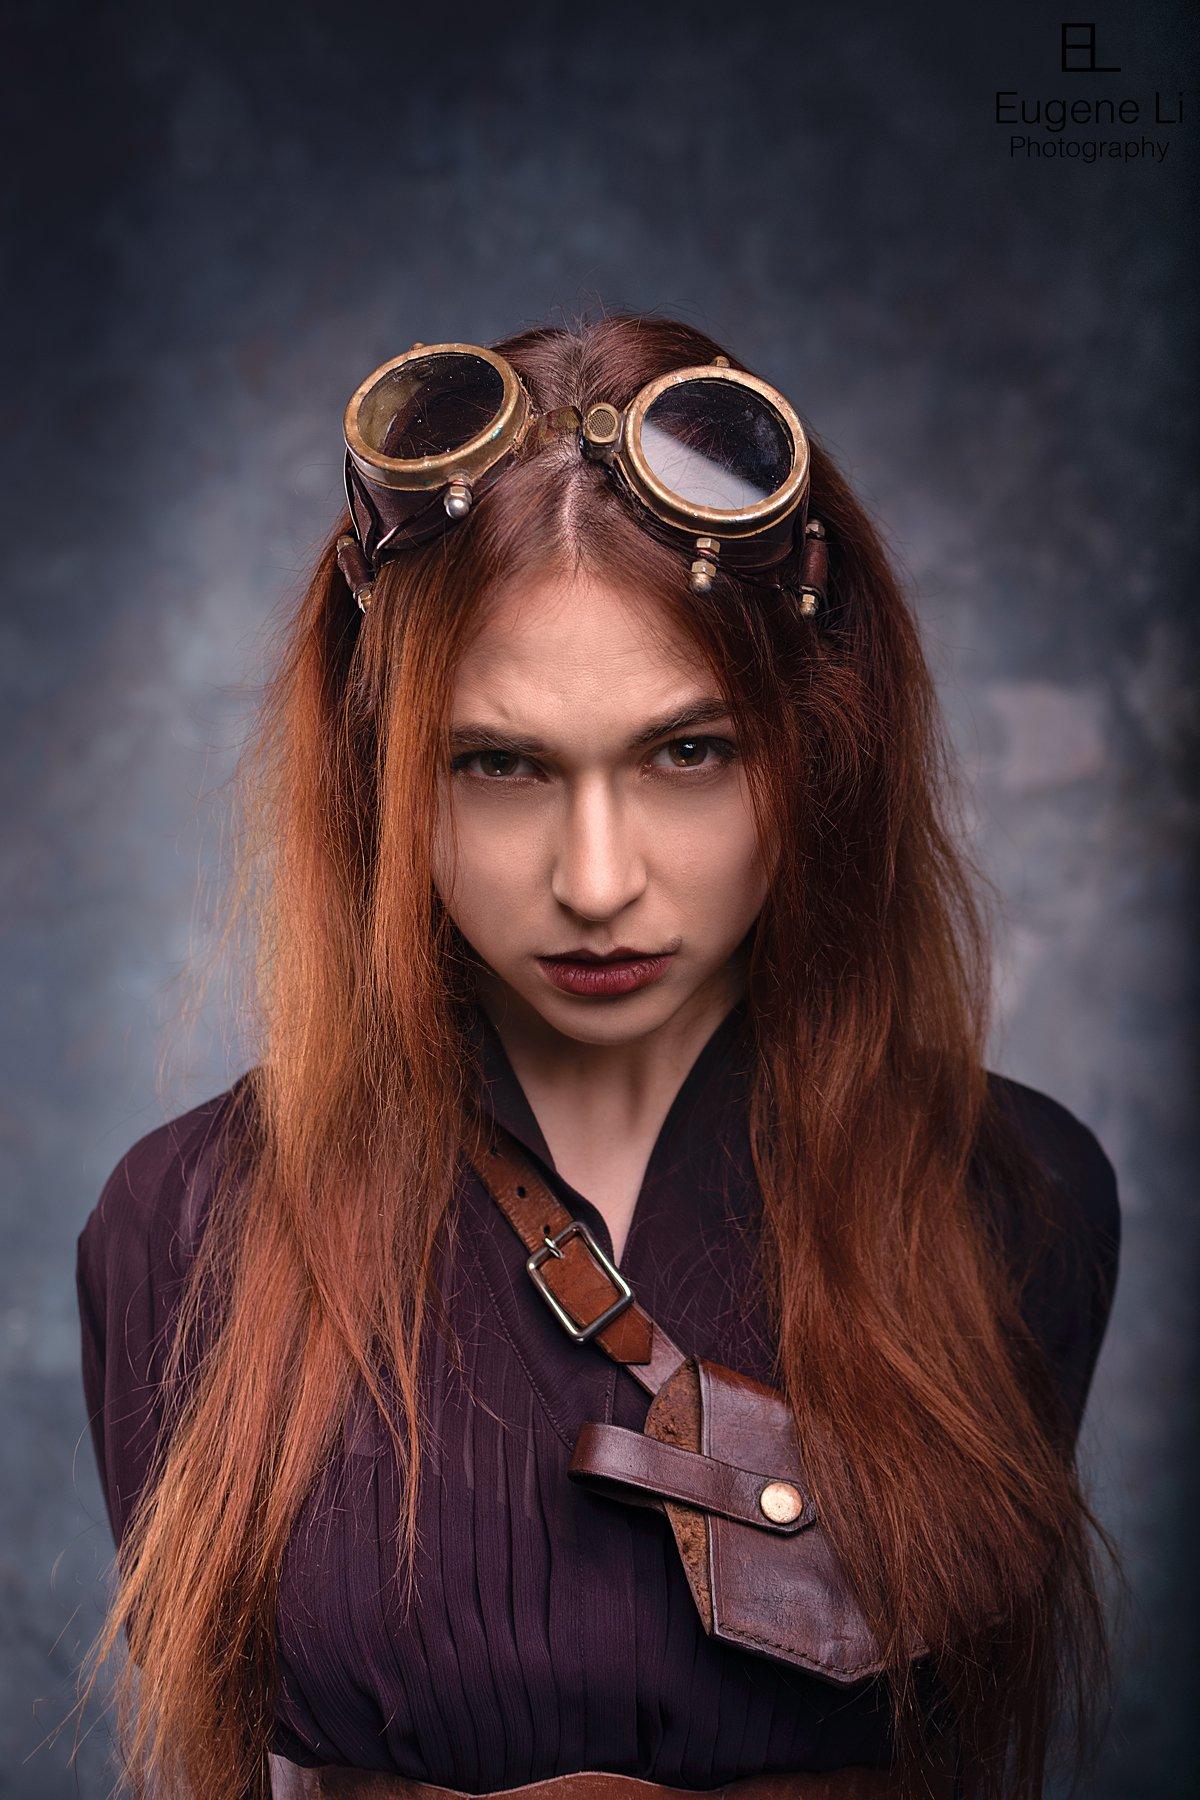 портрет, девушка, стимпанк, Евгений Ли